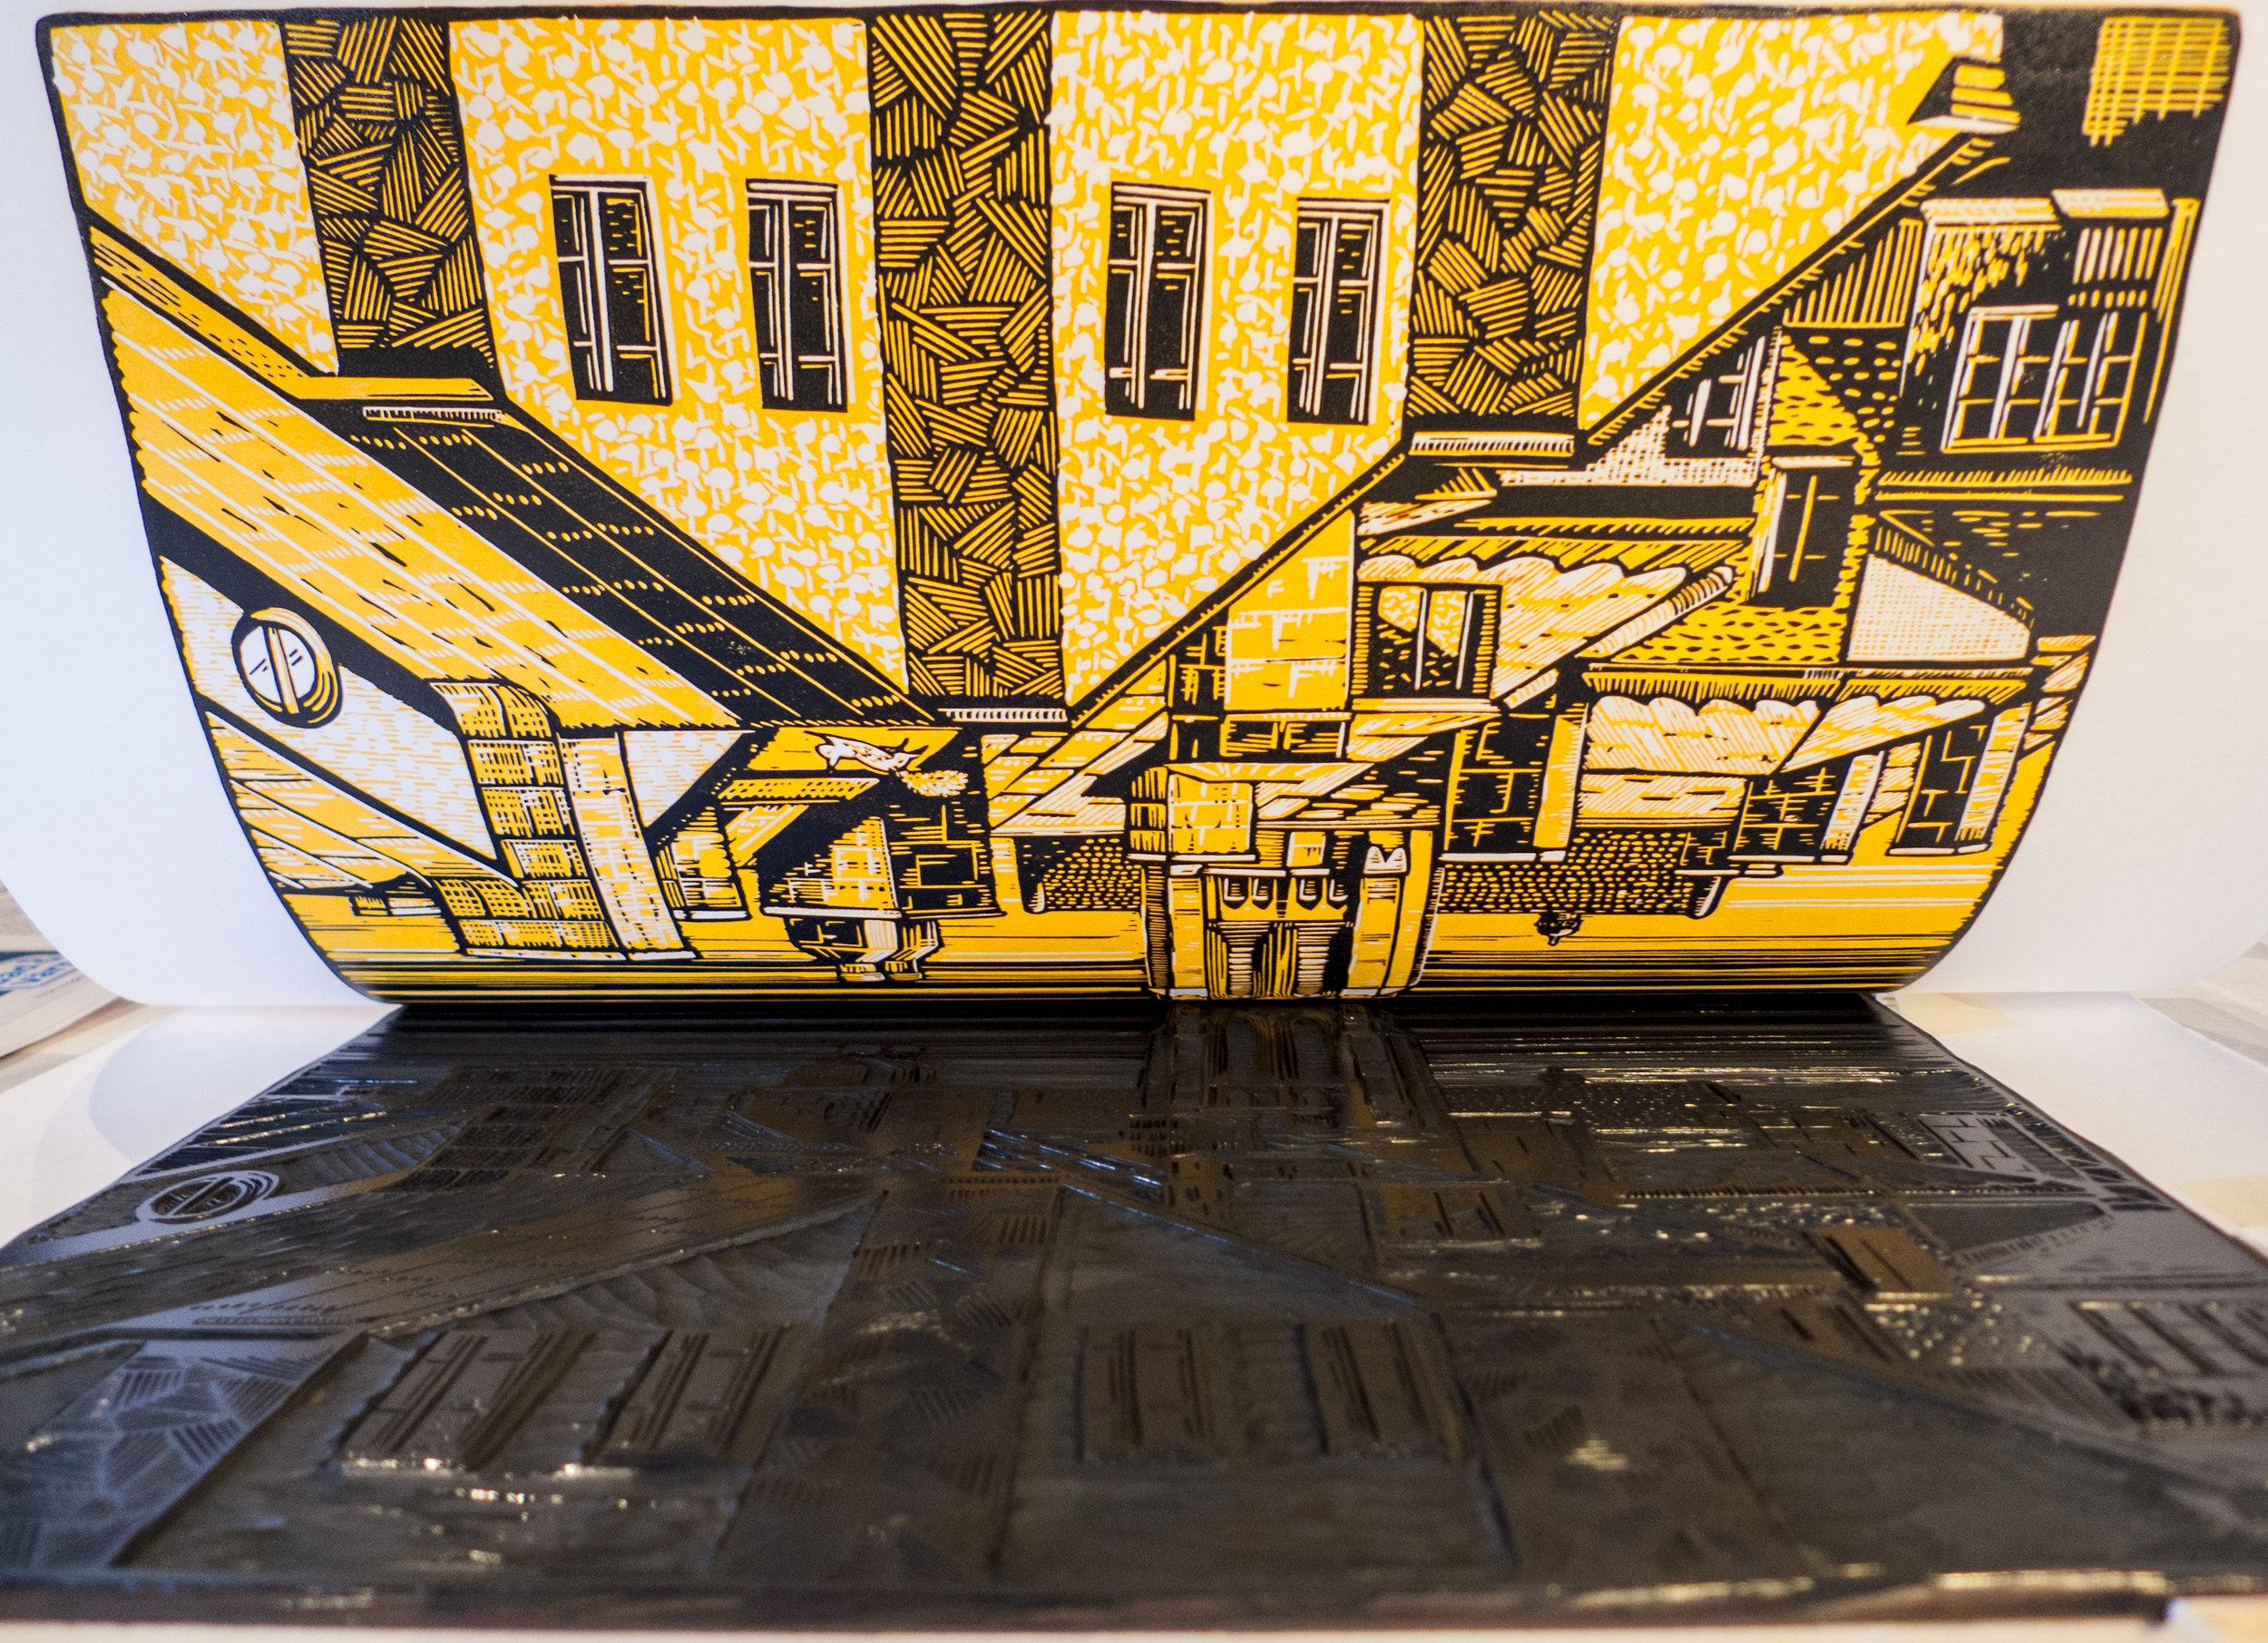 stockholm-st-johannes-kyrka-church-reduction-linocut-1st-layer-yellow-b.jpg